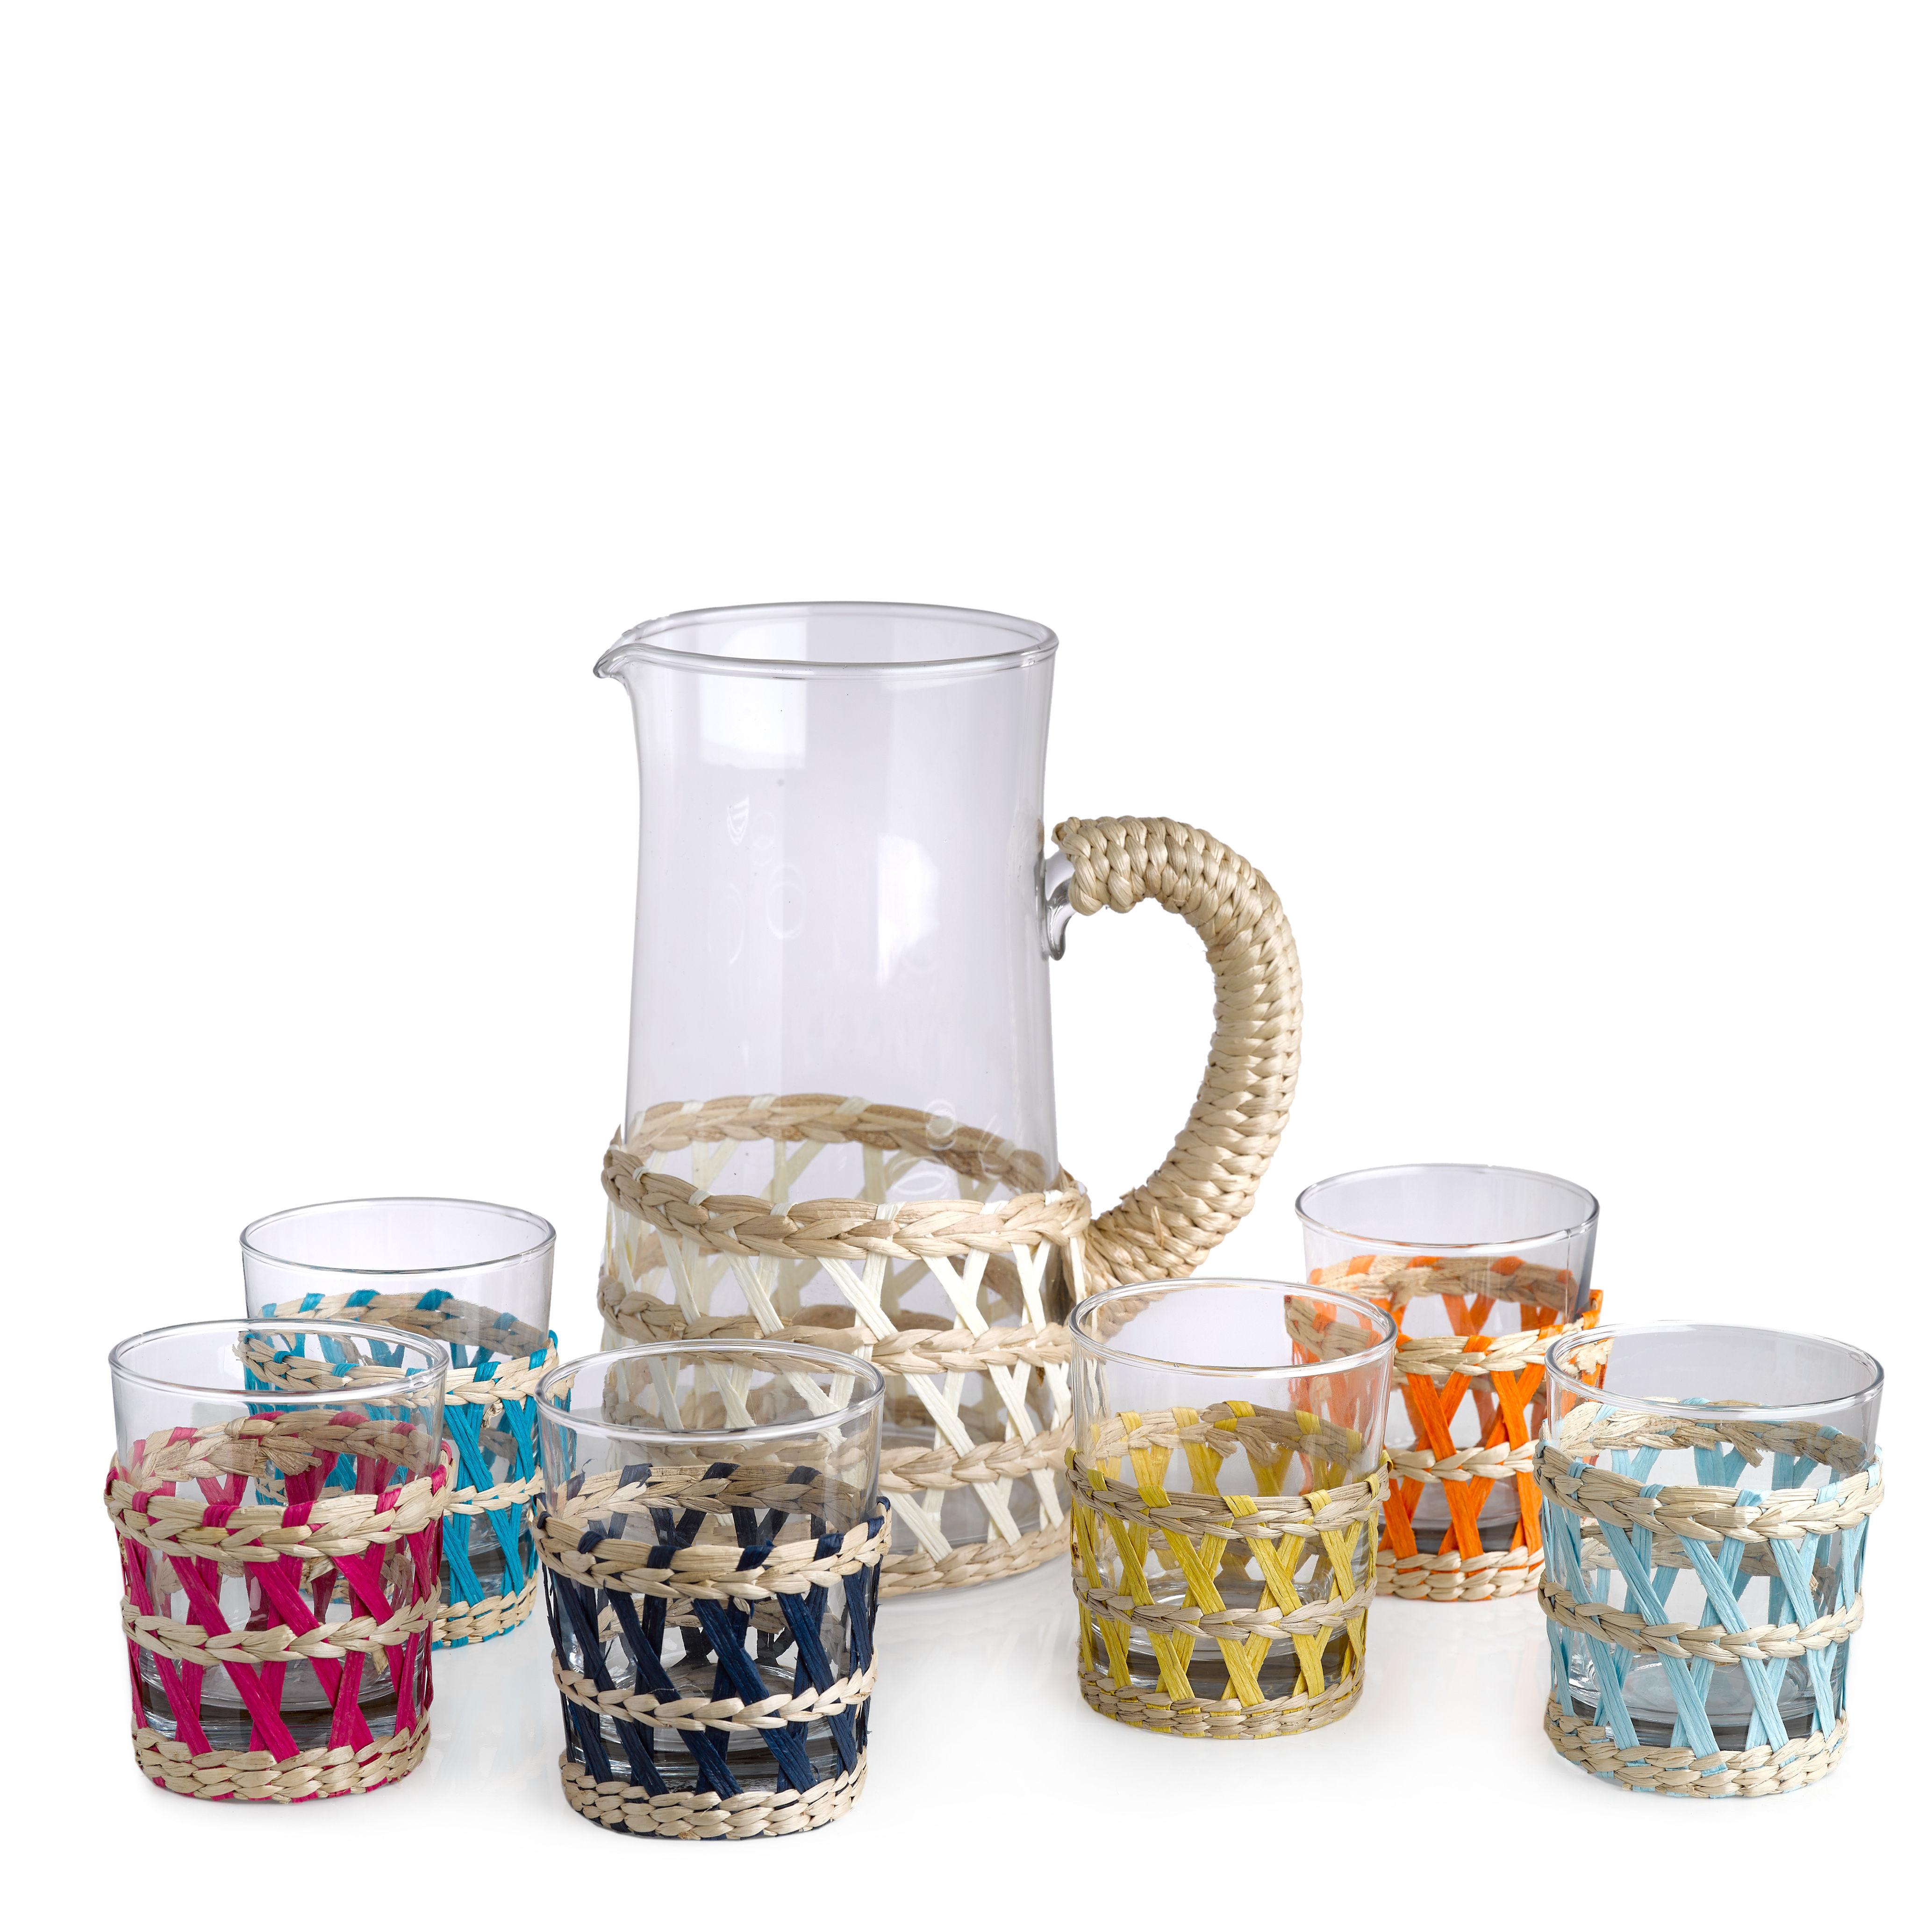 reed wasserglas 6er set glas schilfgeflecht schilfgeflecht natur gef rbt. Black Bedroom Furniture Sets. Home Design Ideas